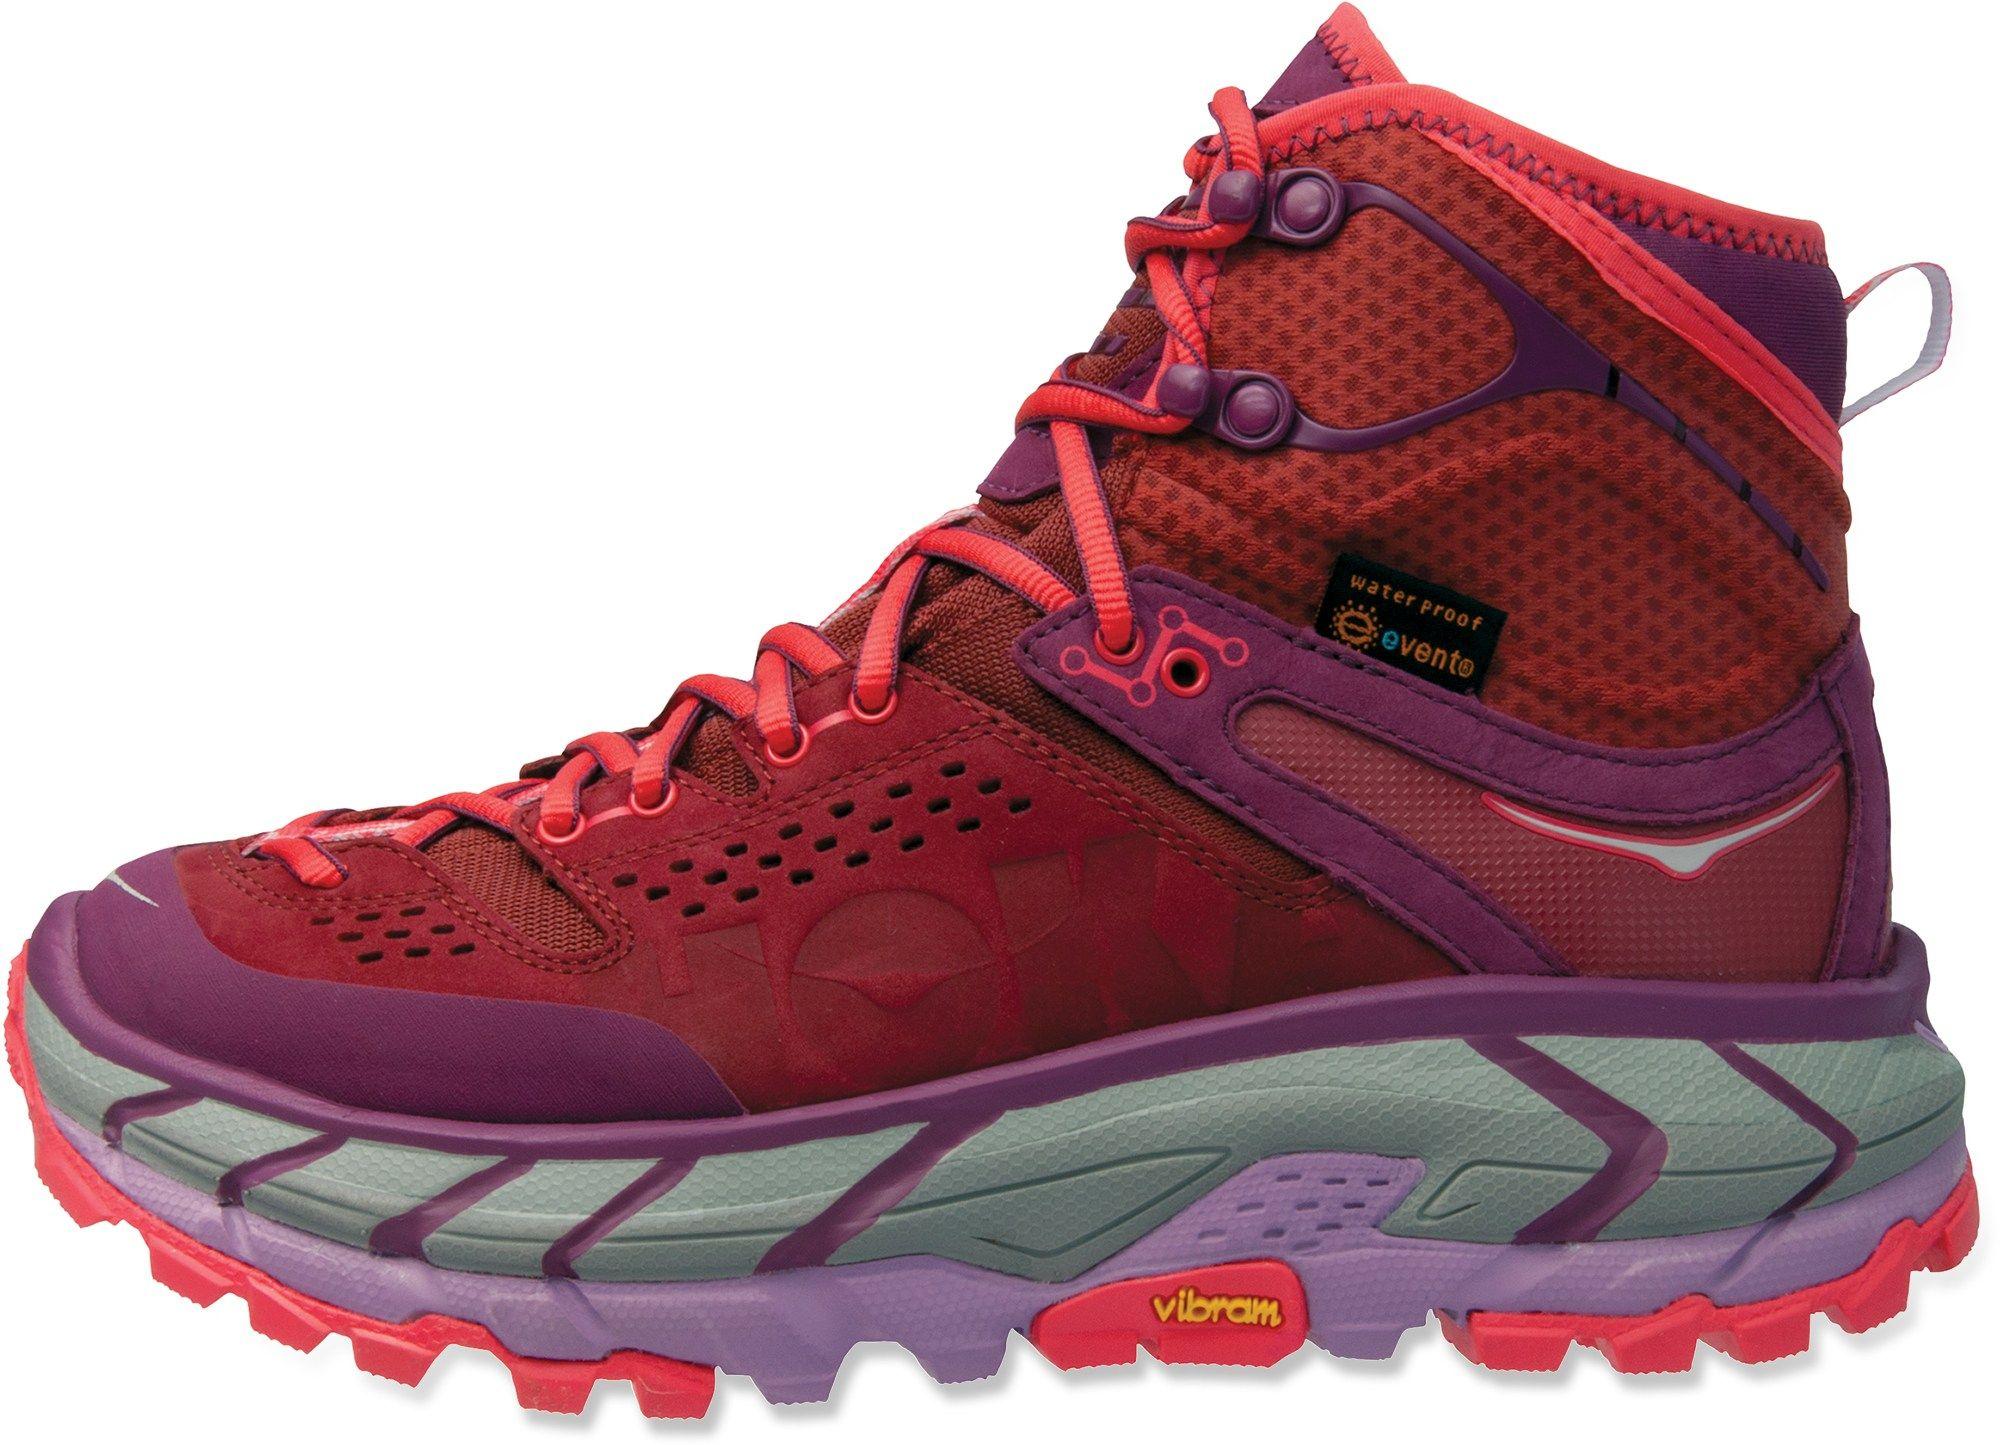 a9f4534eb81 Tor Ultra Hi Waterproof Hiking Boots - Women's | My Style | Hiking ...